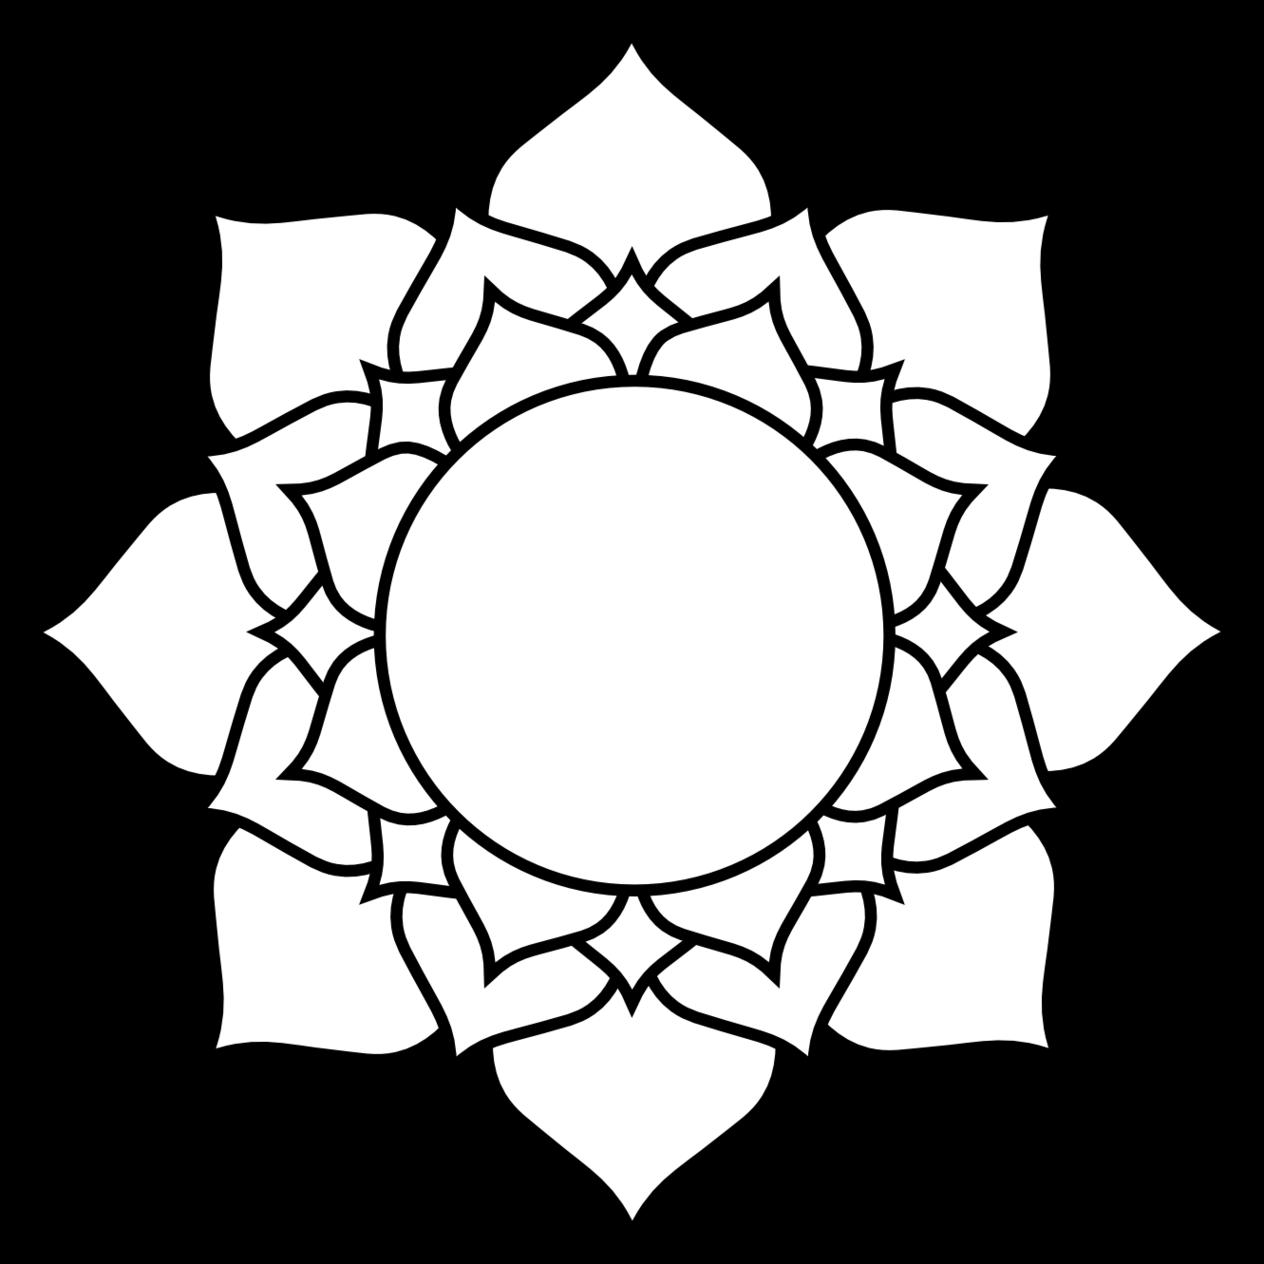 lotus clipart easy